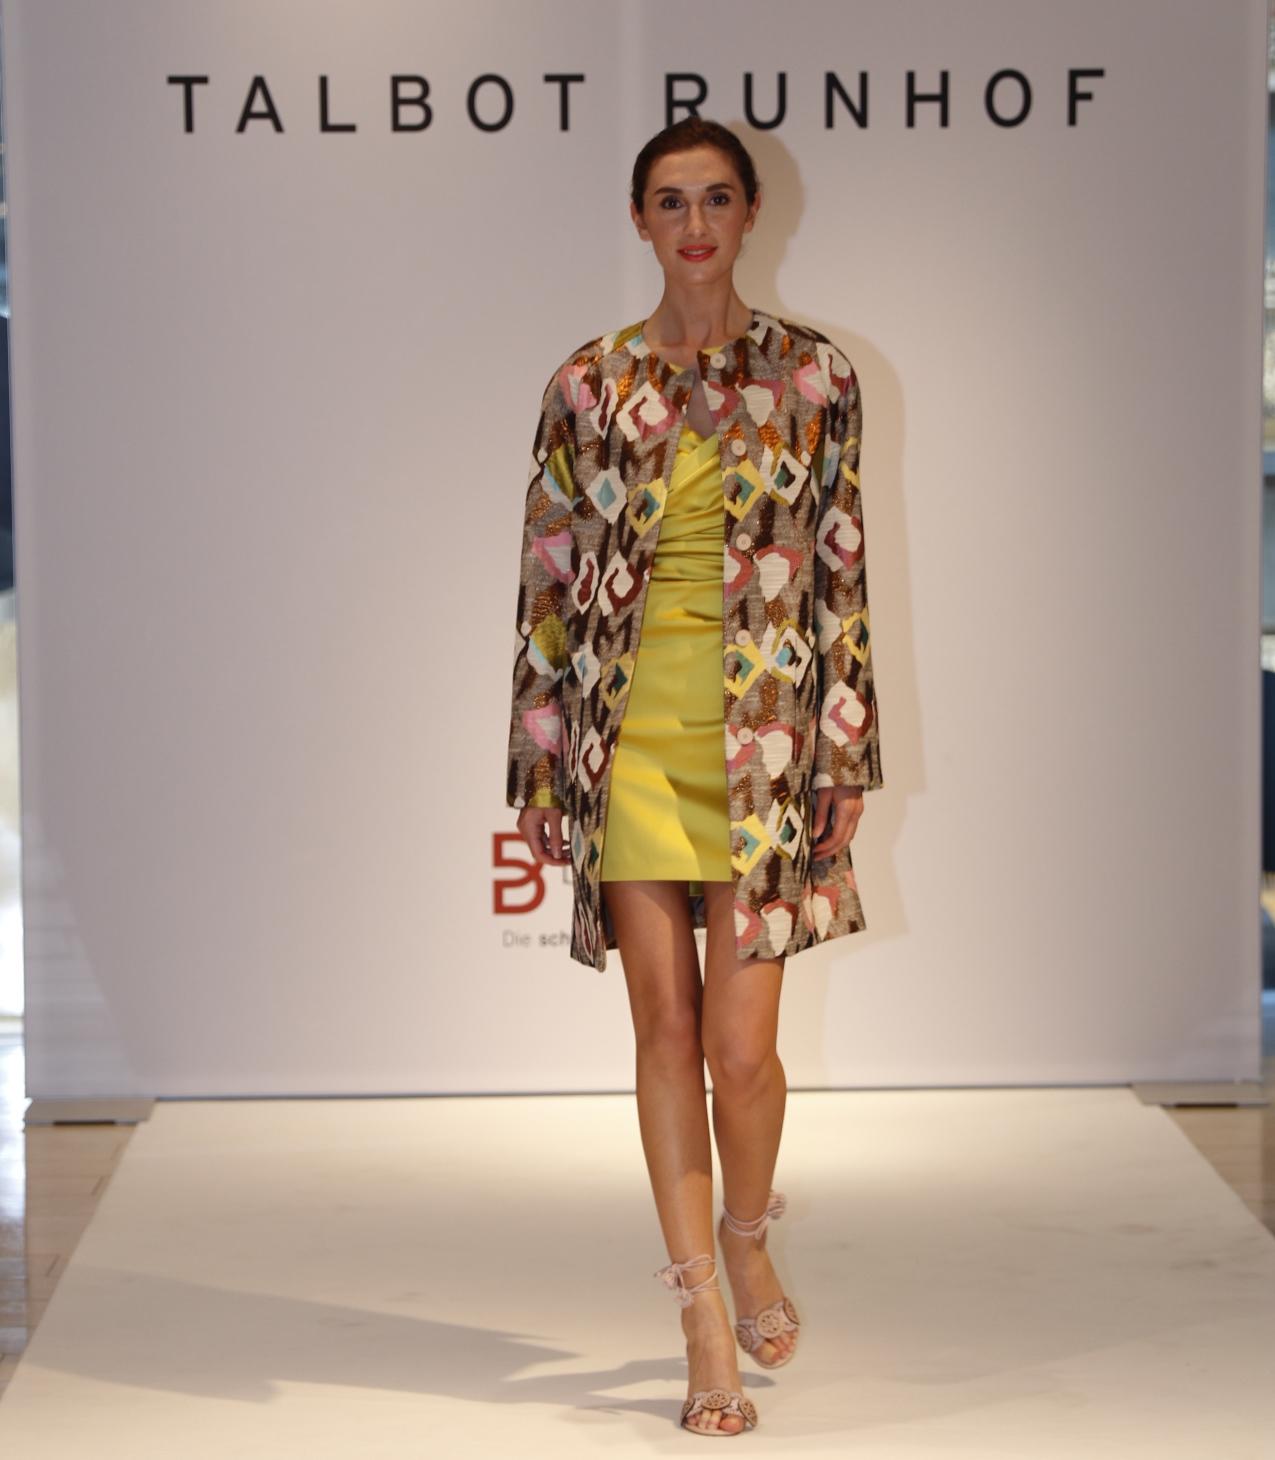 Talbot Runhof Kleid, Talbot Runhof Fashion Show, Breuninger Düsseldorf, Fashion-Blog, Lieblingsstil.comJPG